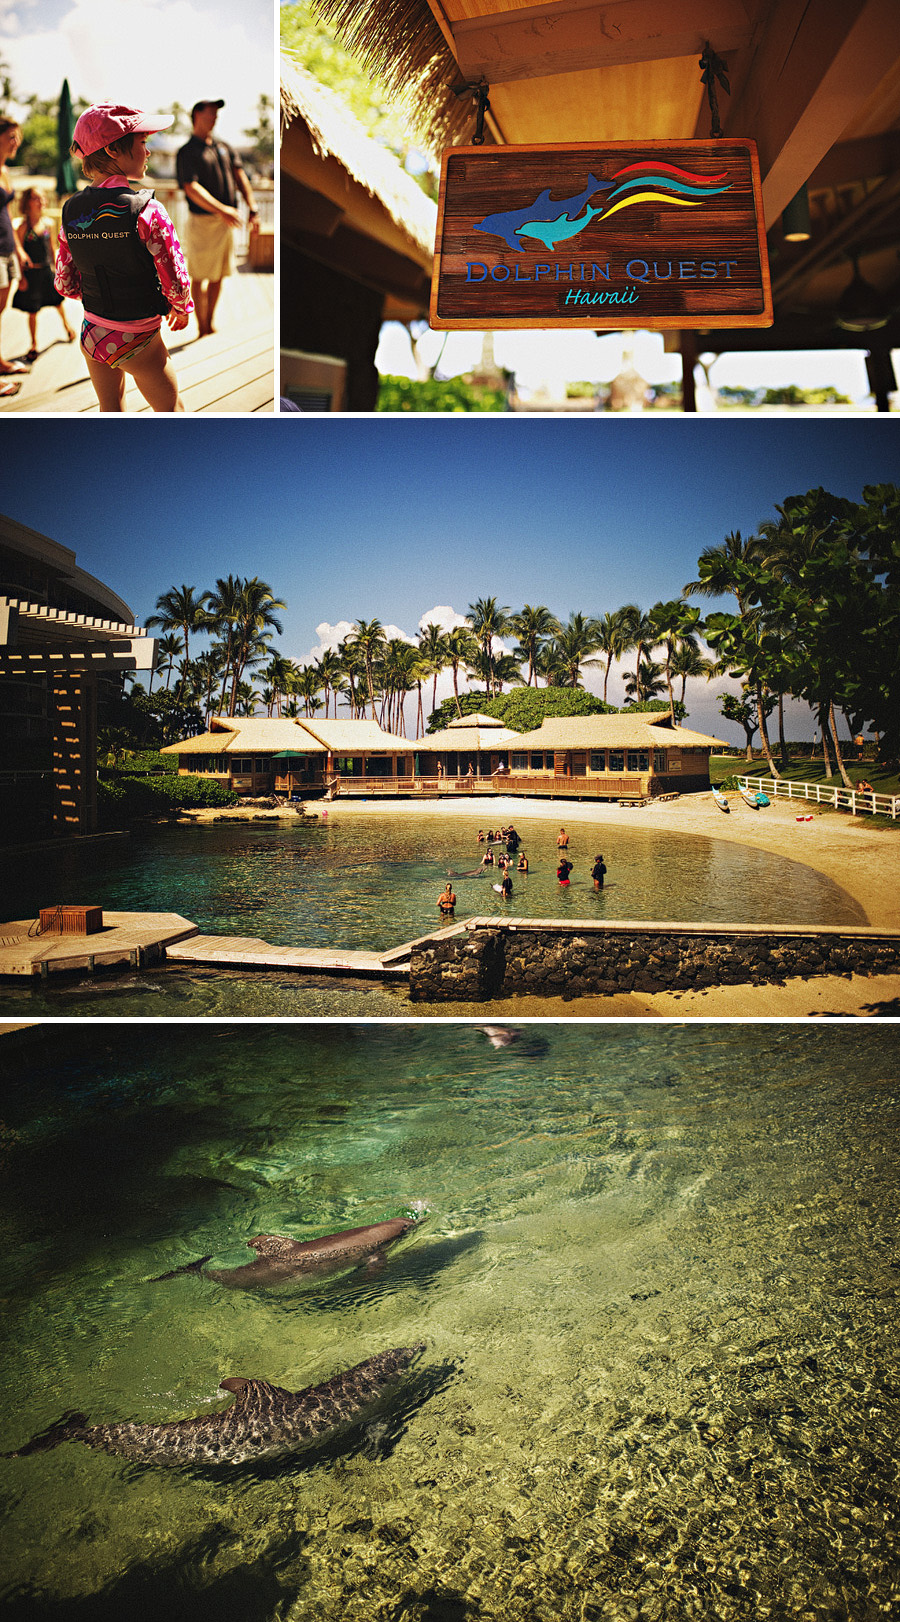 Hawaiian travel photography scenes from Dolphin Quest at the Waikaloa Village Hilton Hotel on the Big Island.